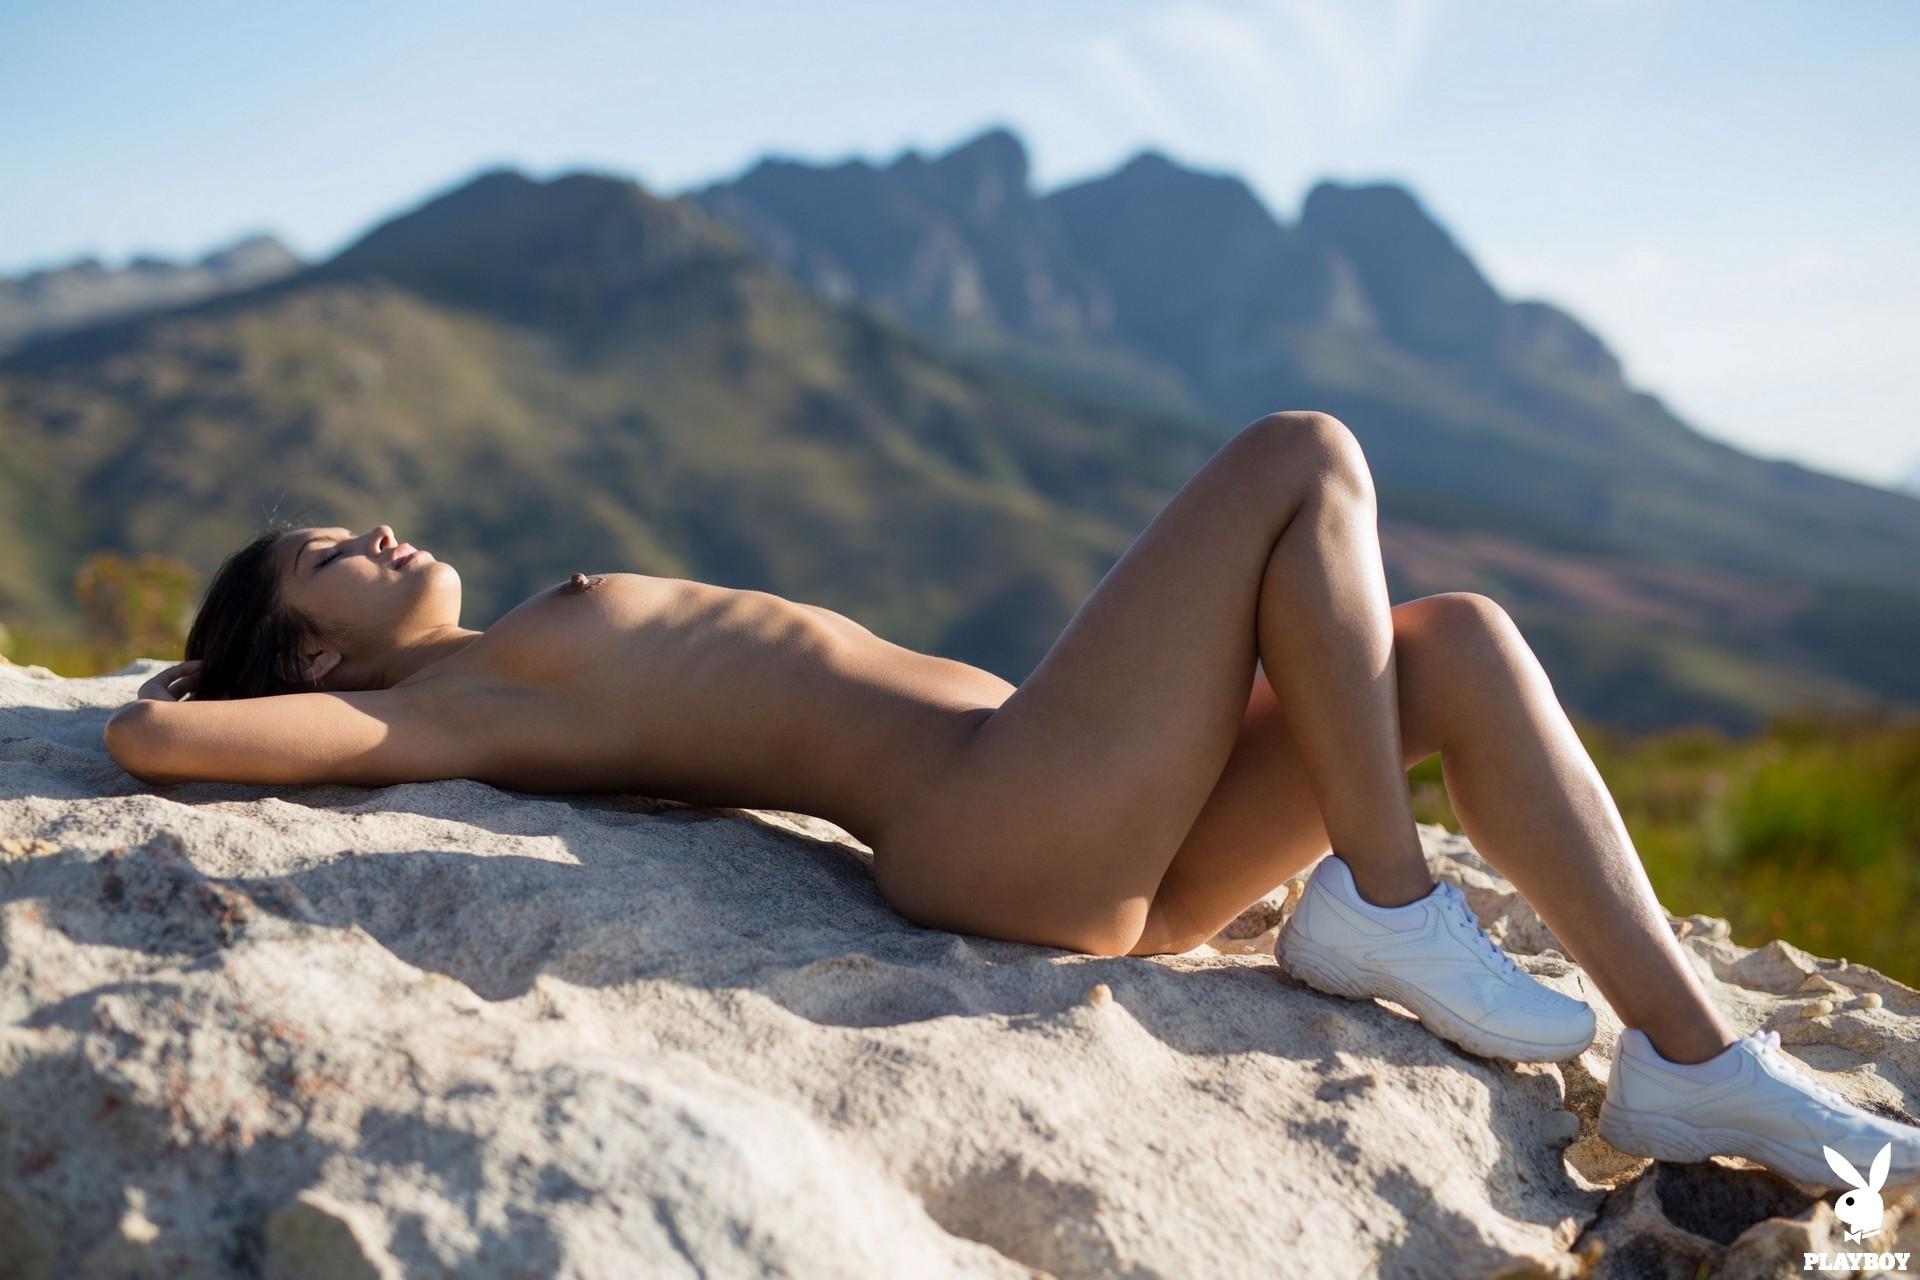 Chloe Rose in Trail Blazing 9